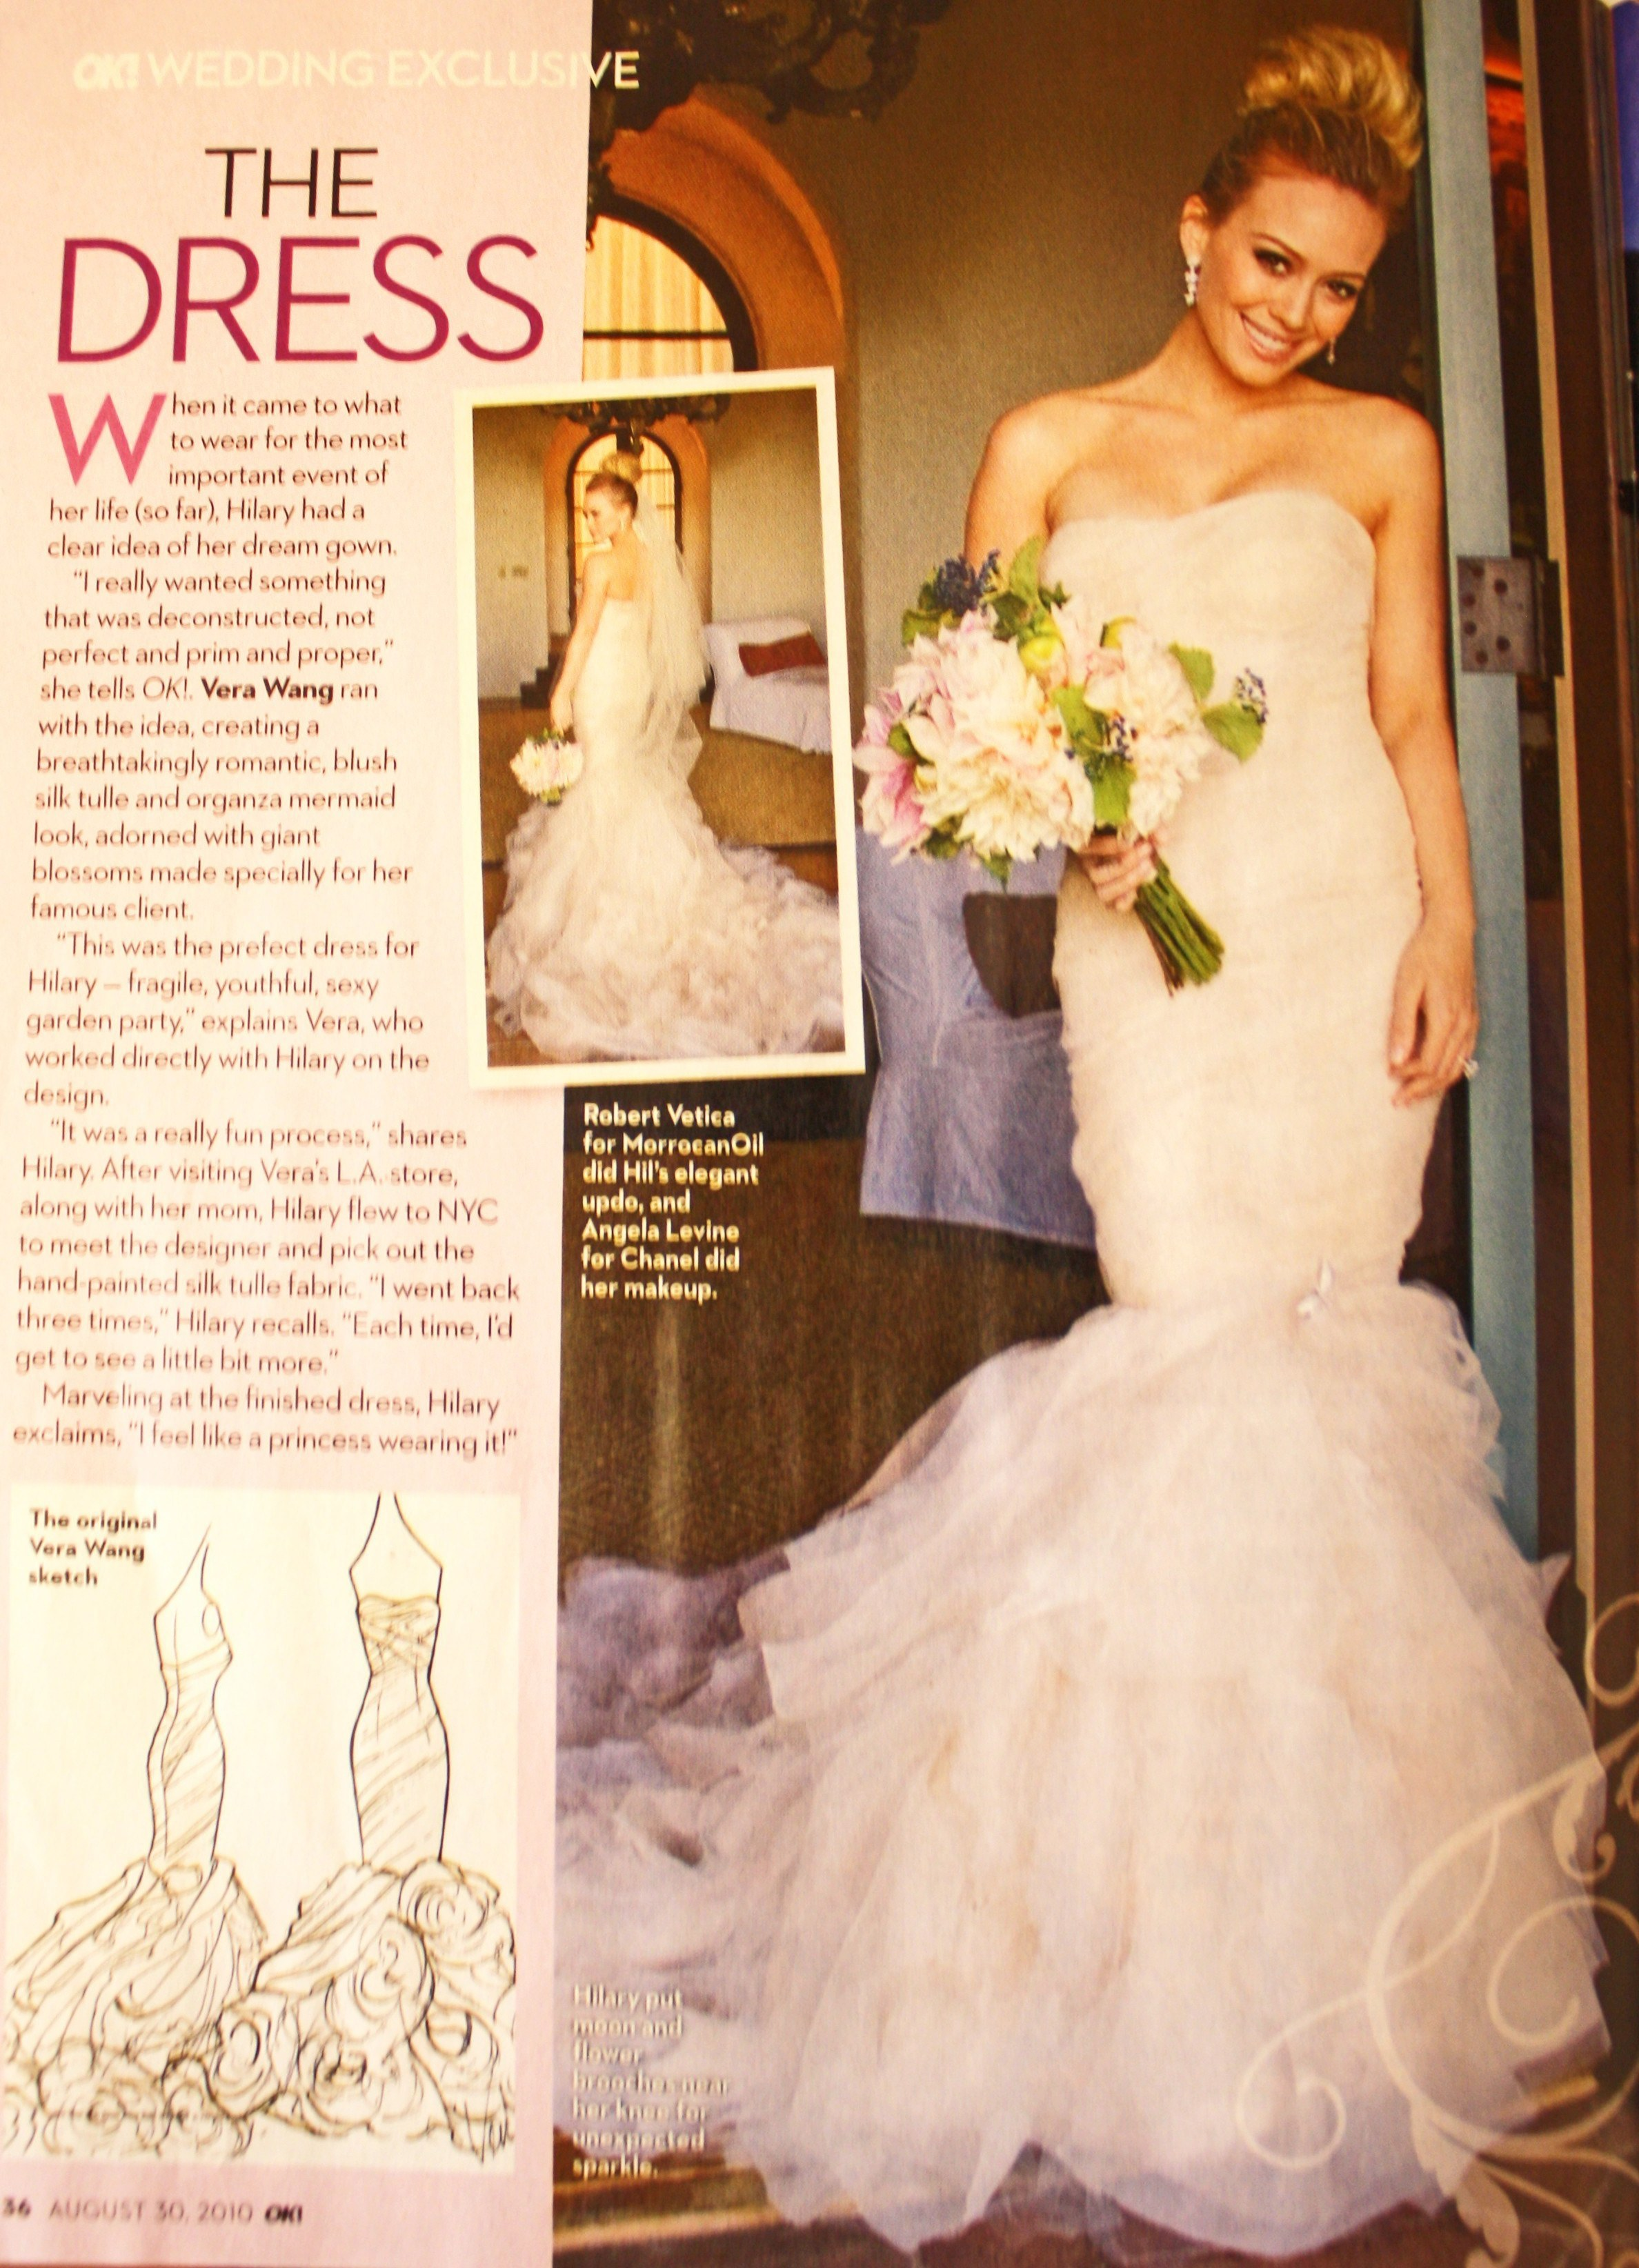 Design Dress Hijab Bridesmaid 4pde Wedding Ideas White and Gold Wedding Dress the Newest